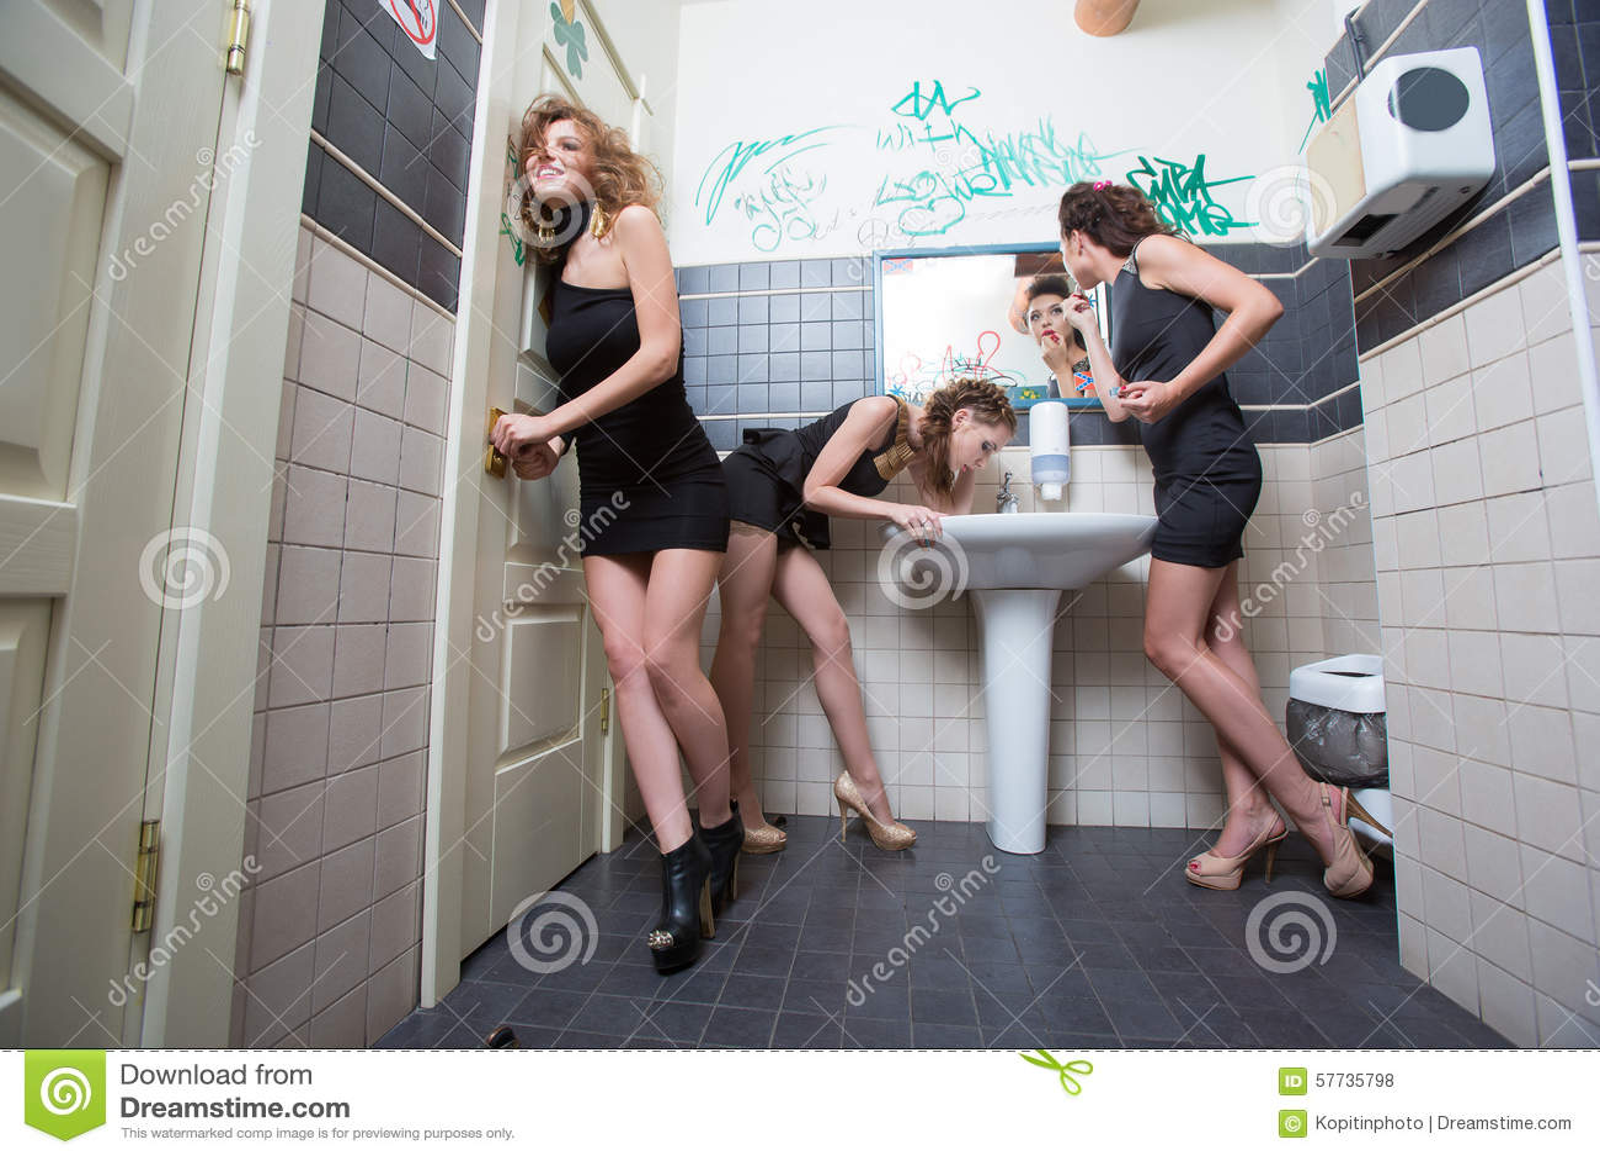 Девушки фото красивые в туалете